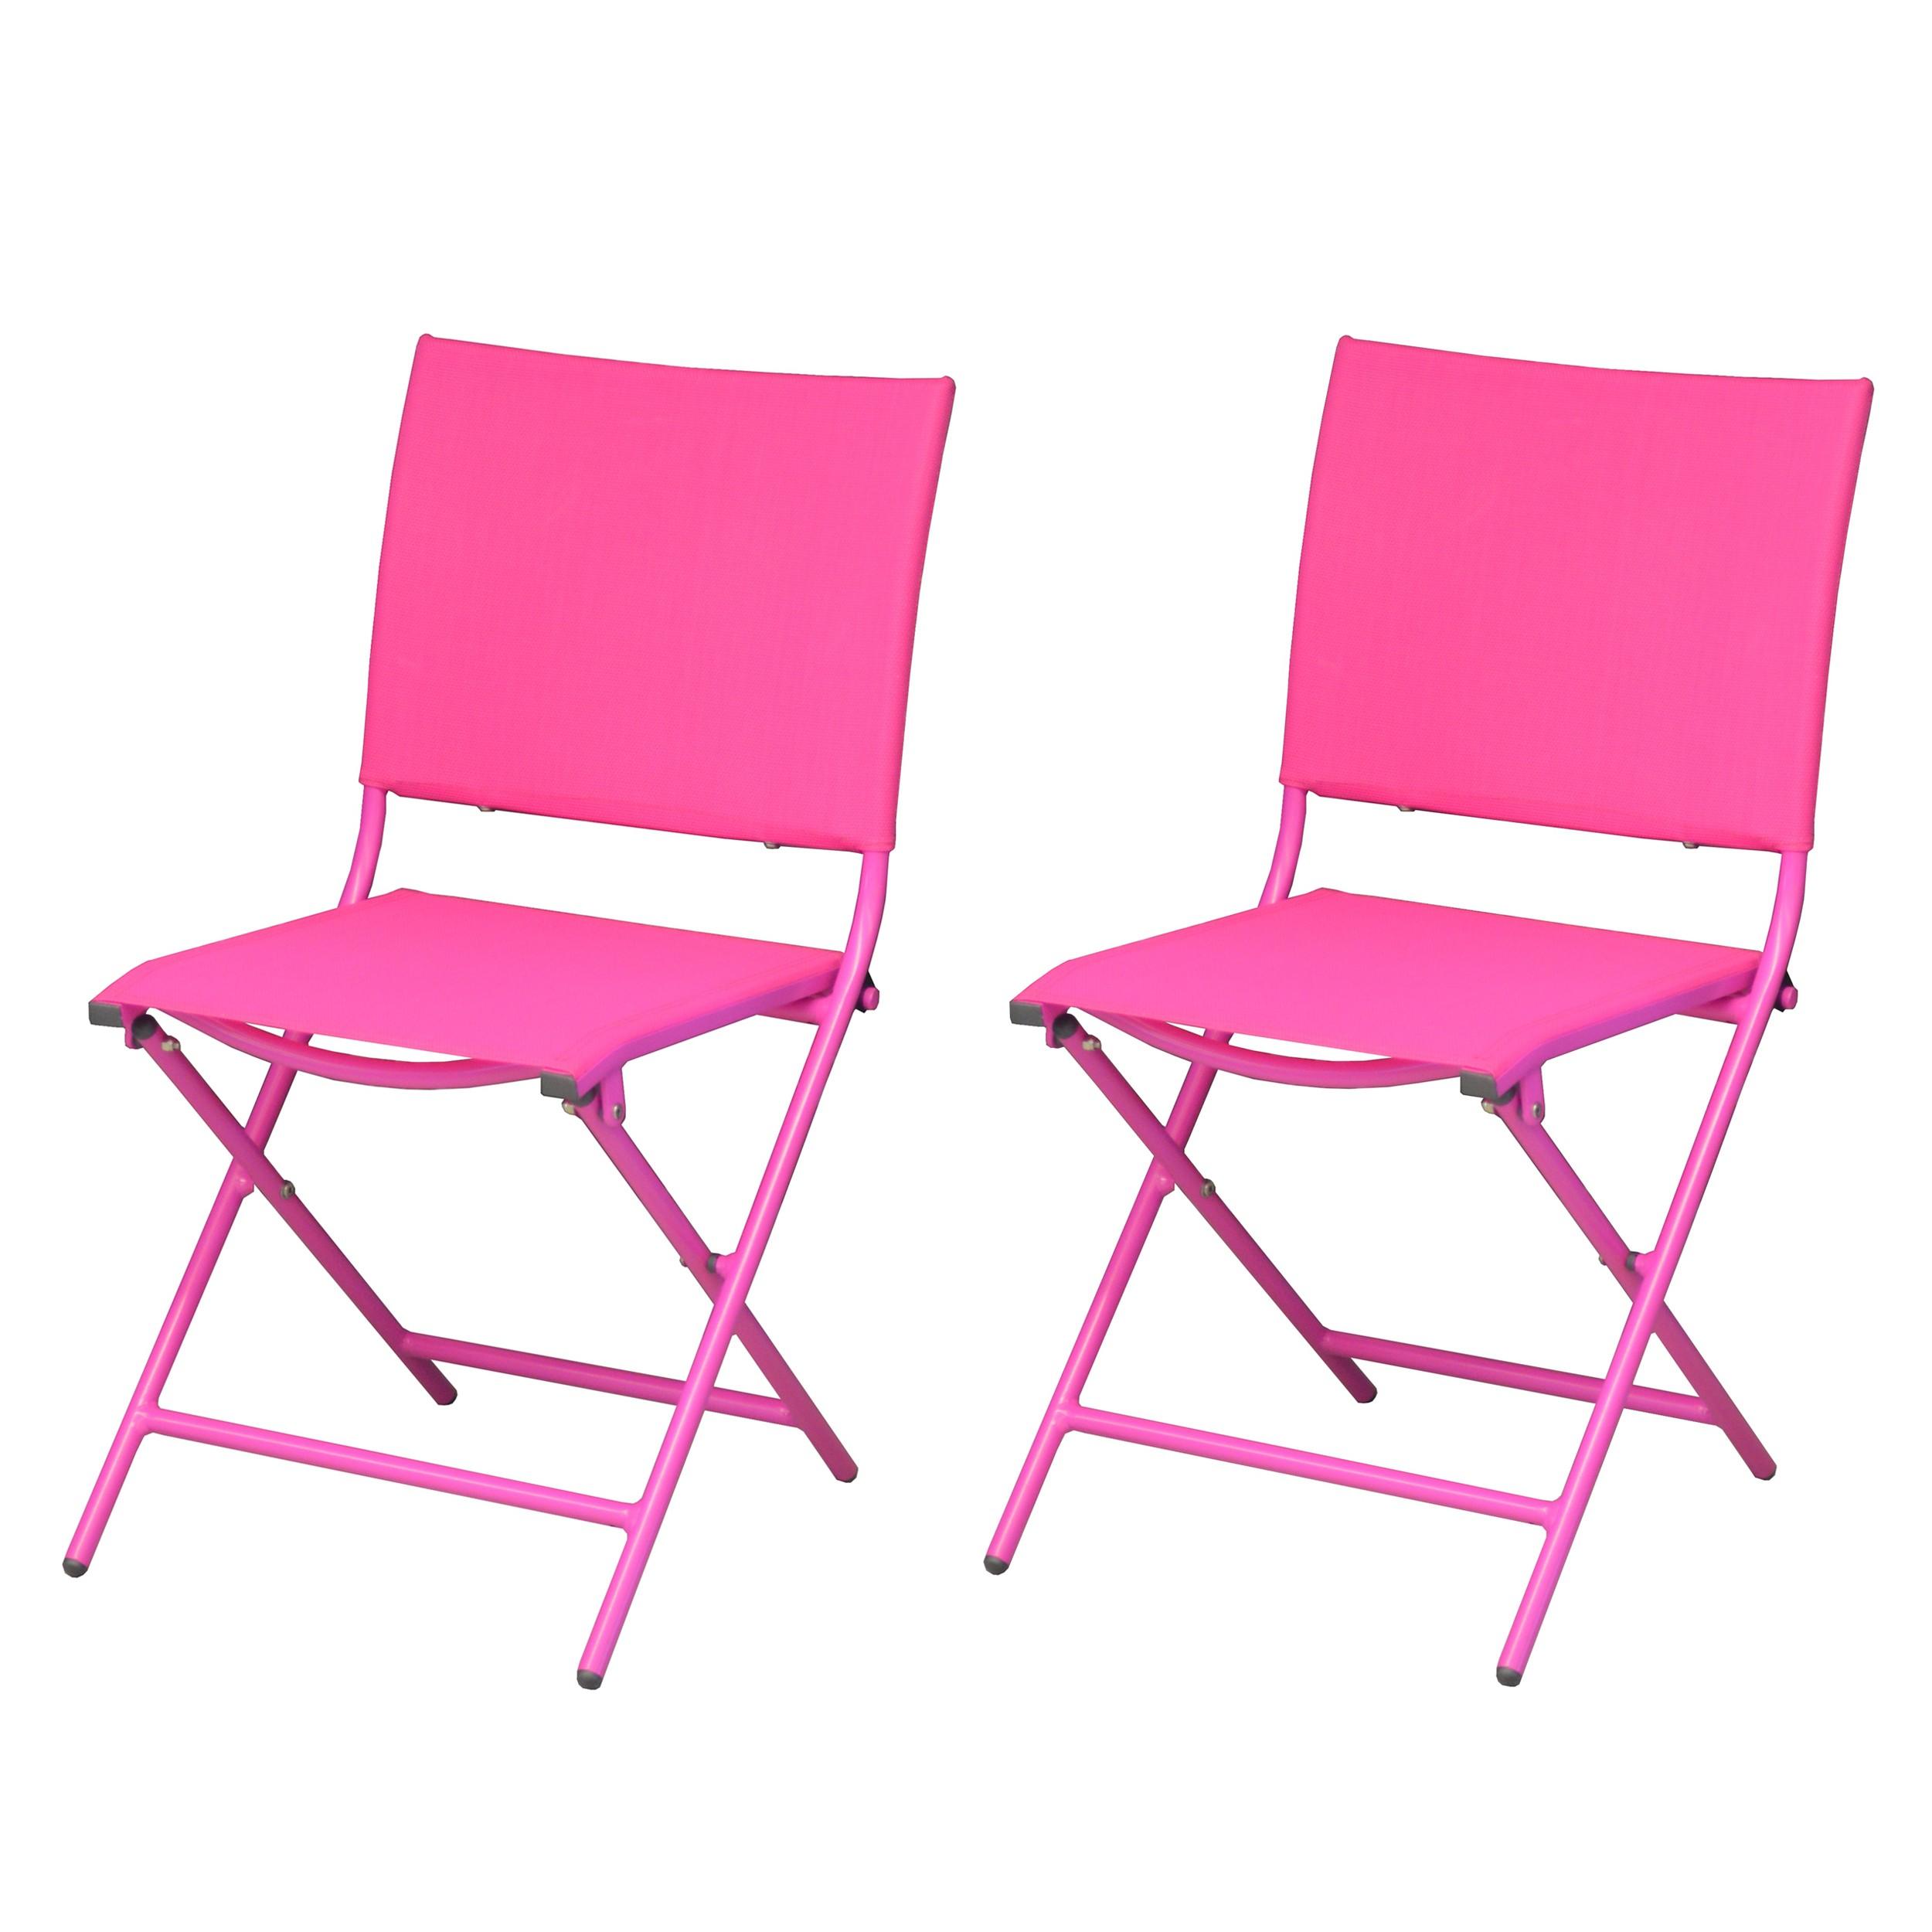 Emejing chaise de jardin rose contemporary design trends for Chaise design rose